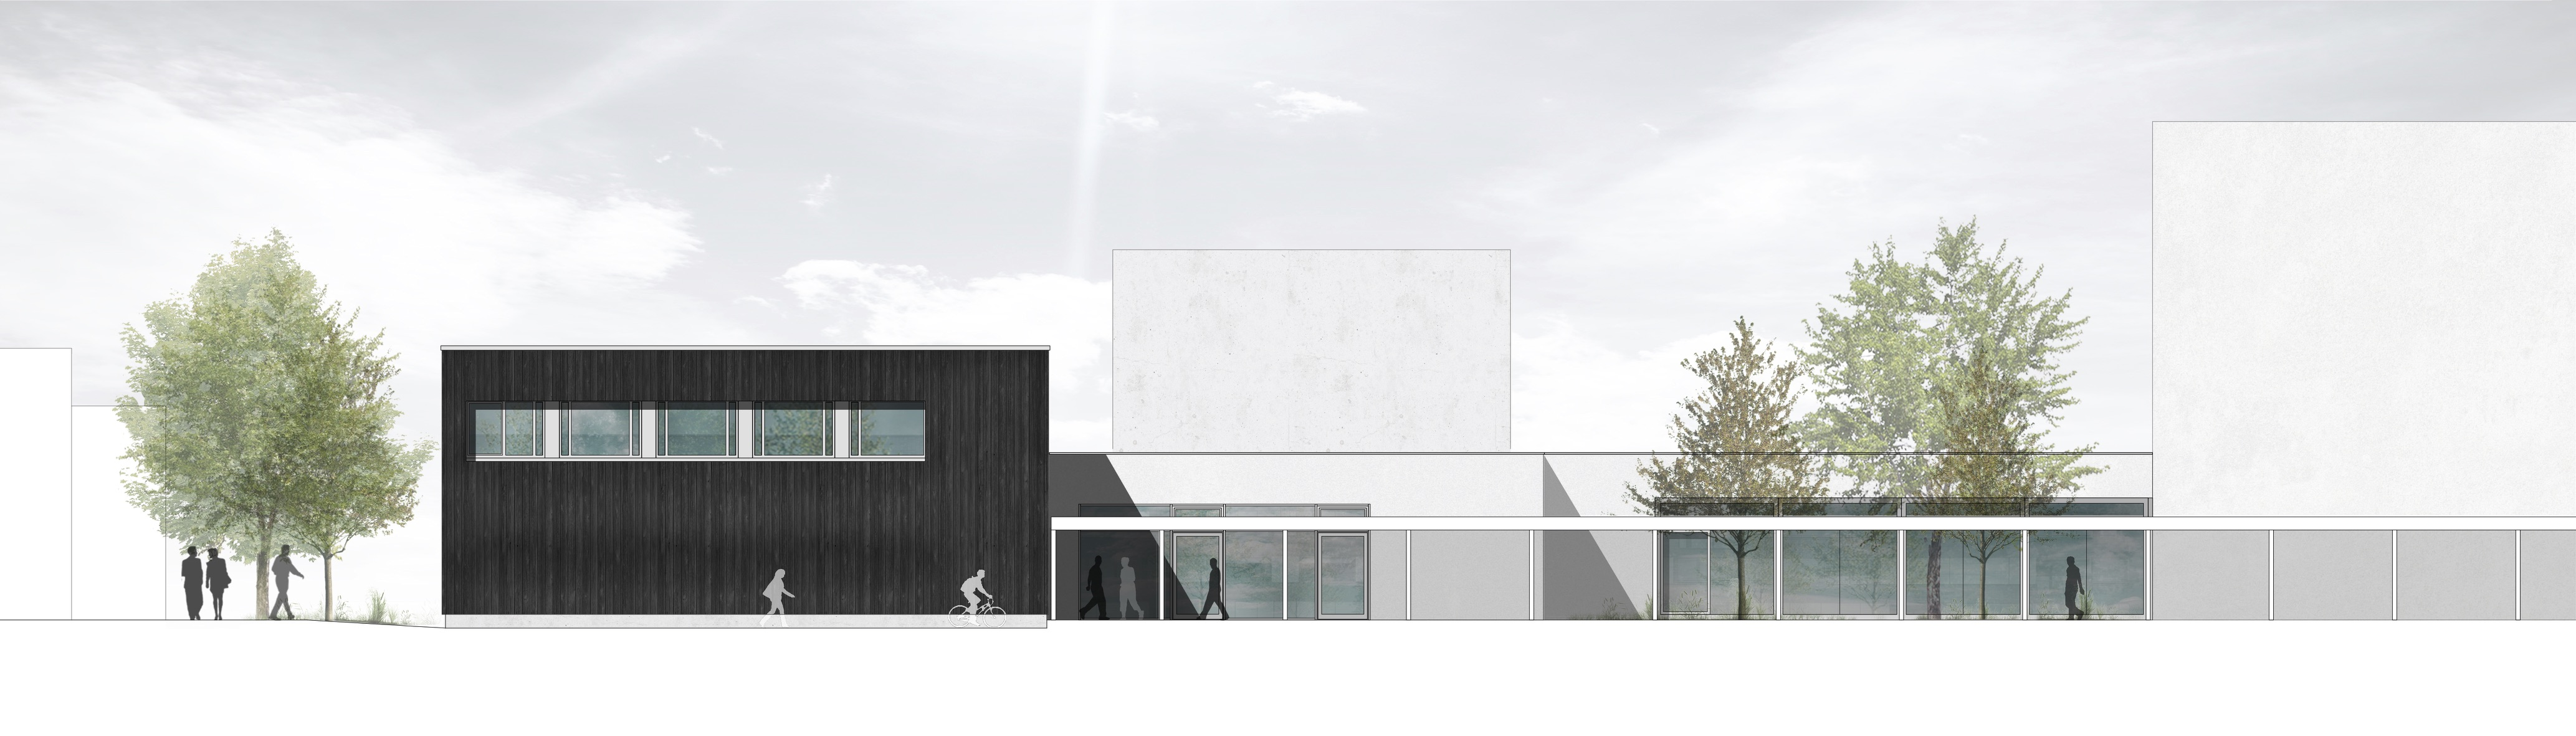 kaestle&ocker - Umbau THG Turnhalle